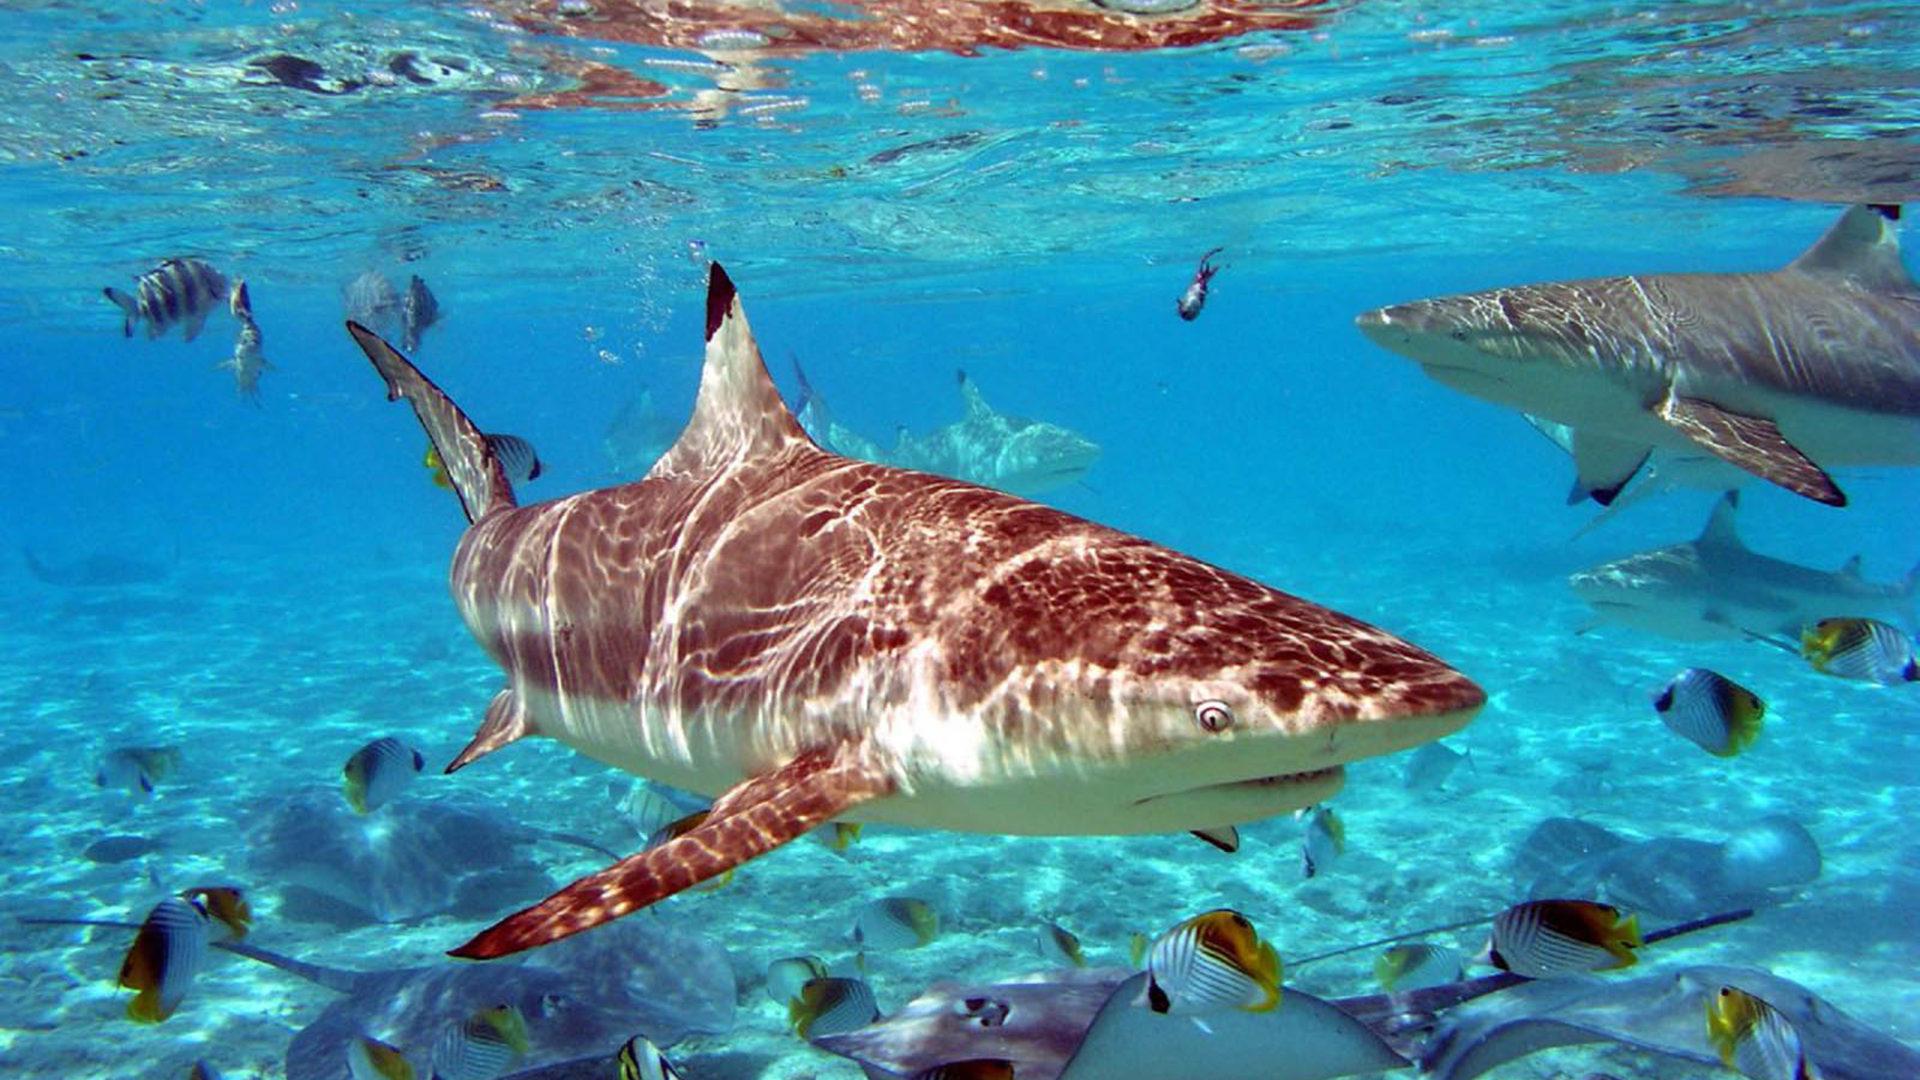 Shark Desktop Wallpaper Free Download